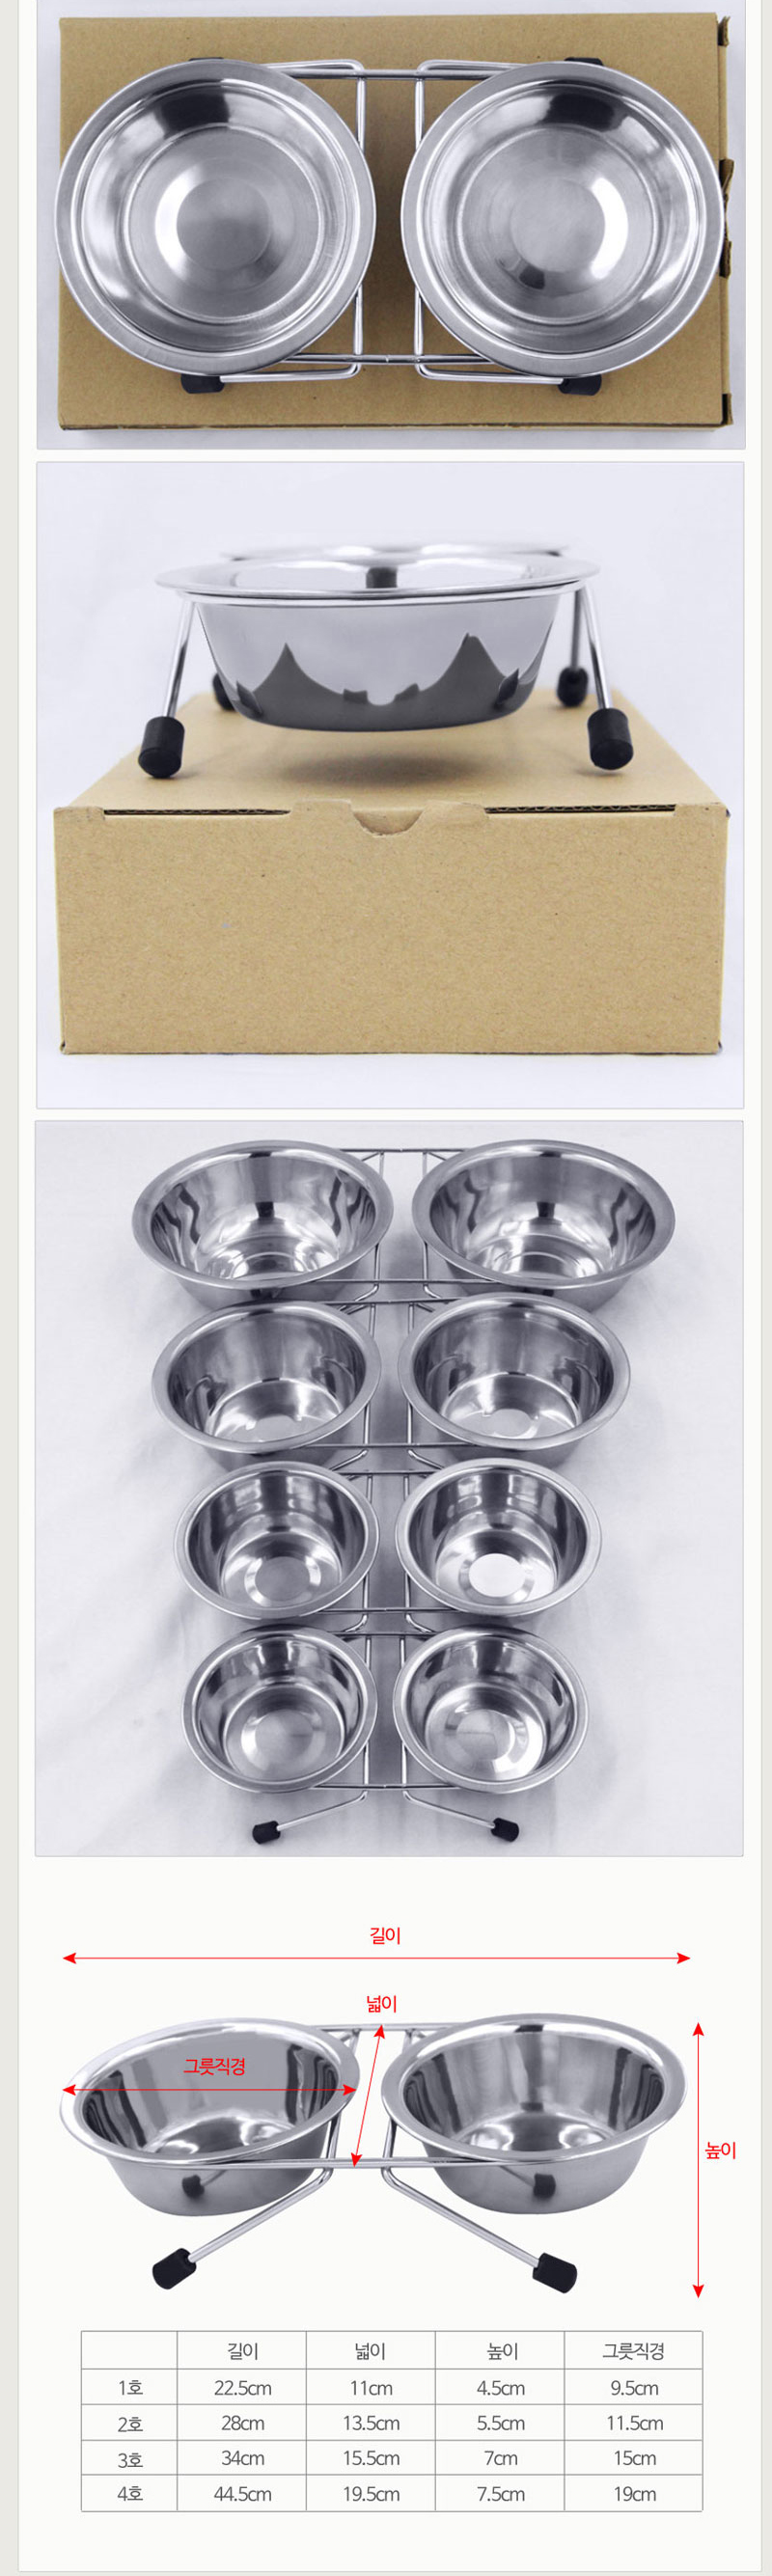 TTpet 트윈 스텐보울 식기 1호 - 스토어봄, 4,700원, 급수/급식기, 식기/식탁